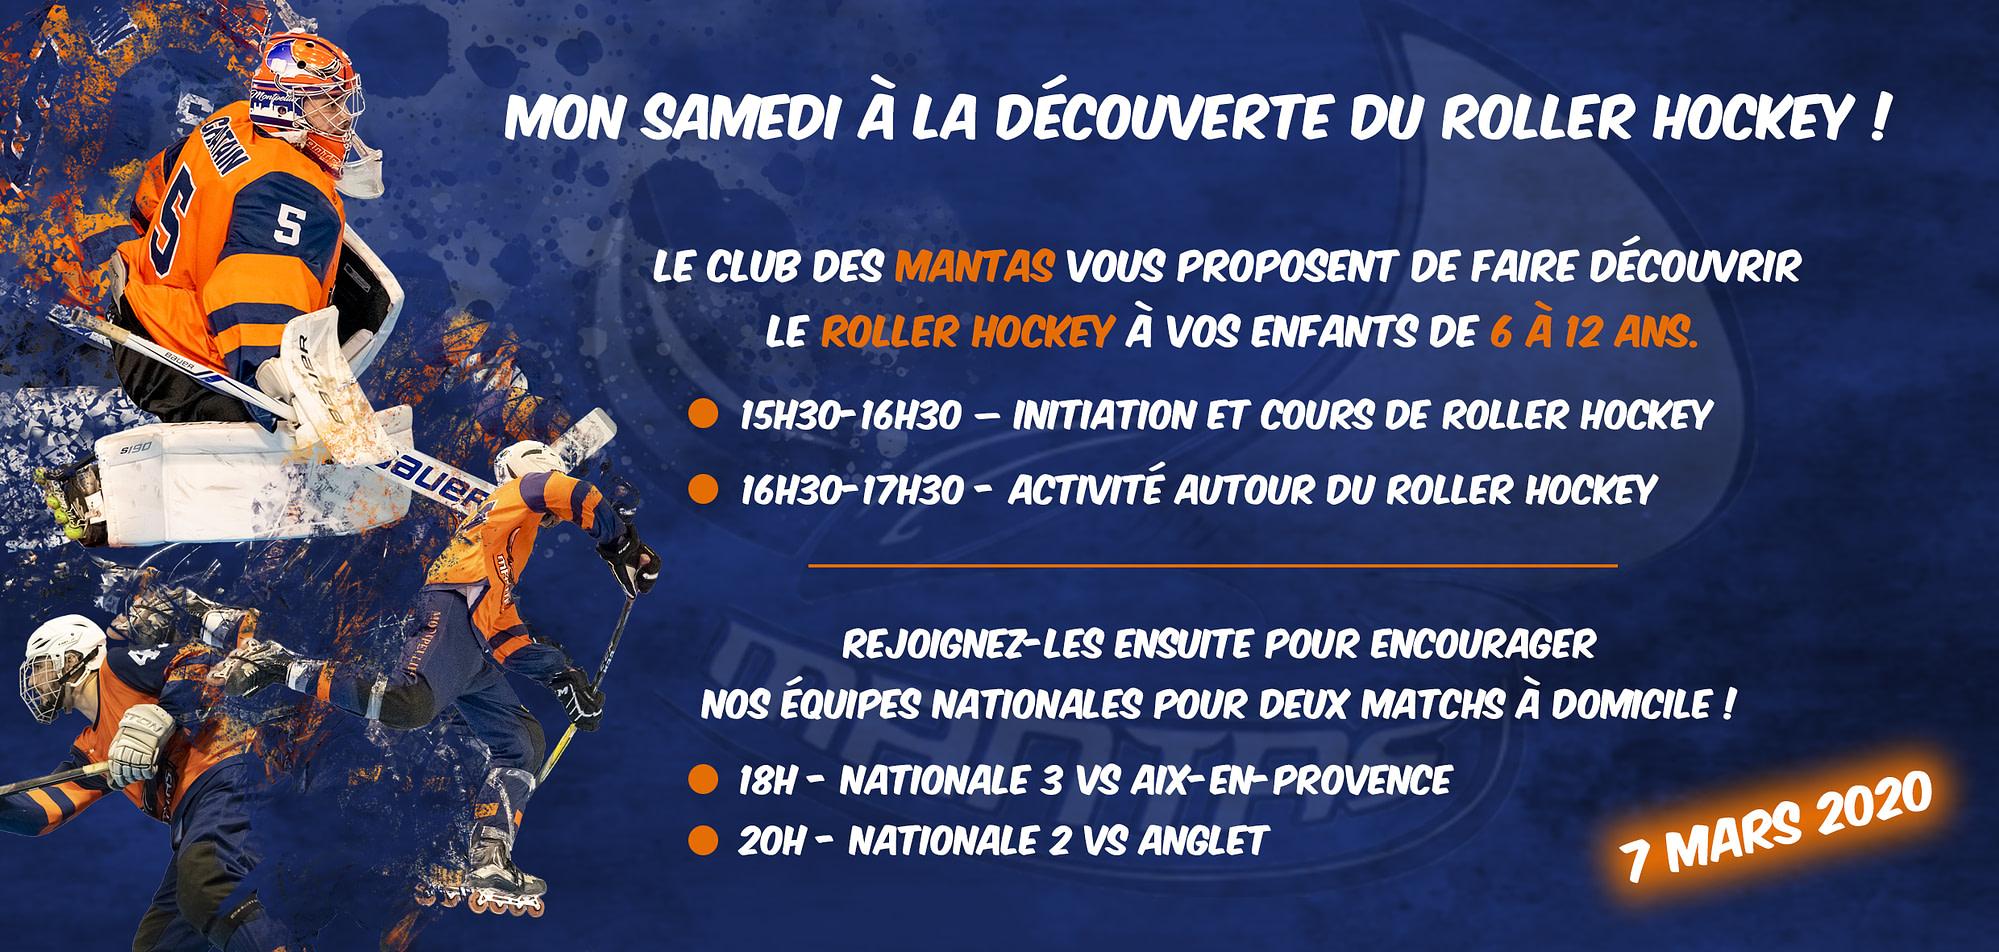 Découverte du Roller Hockey (07/03)